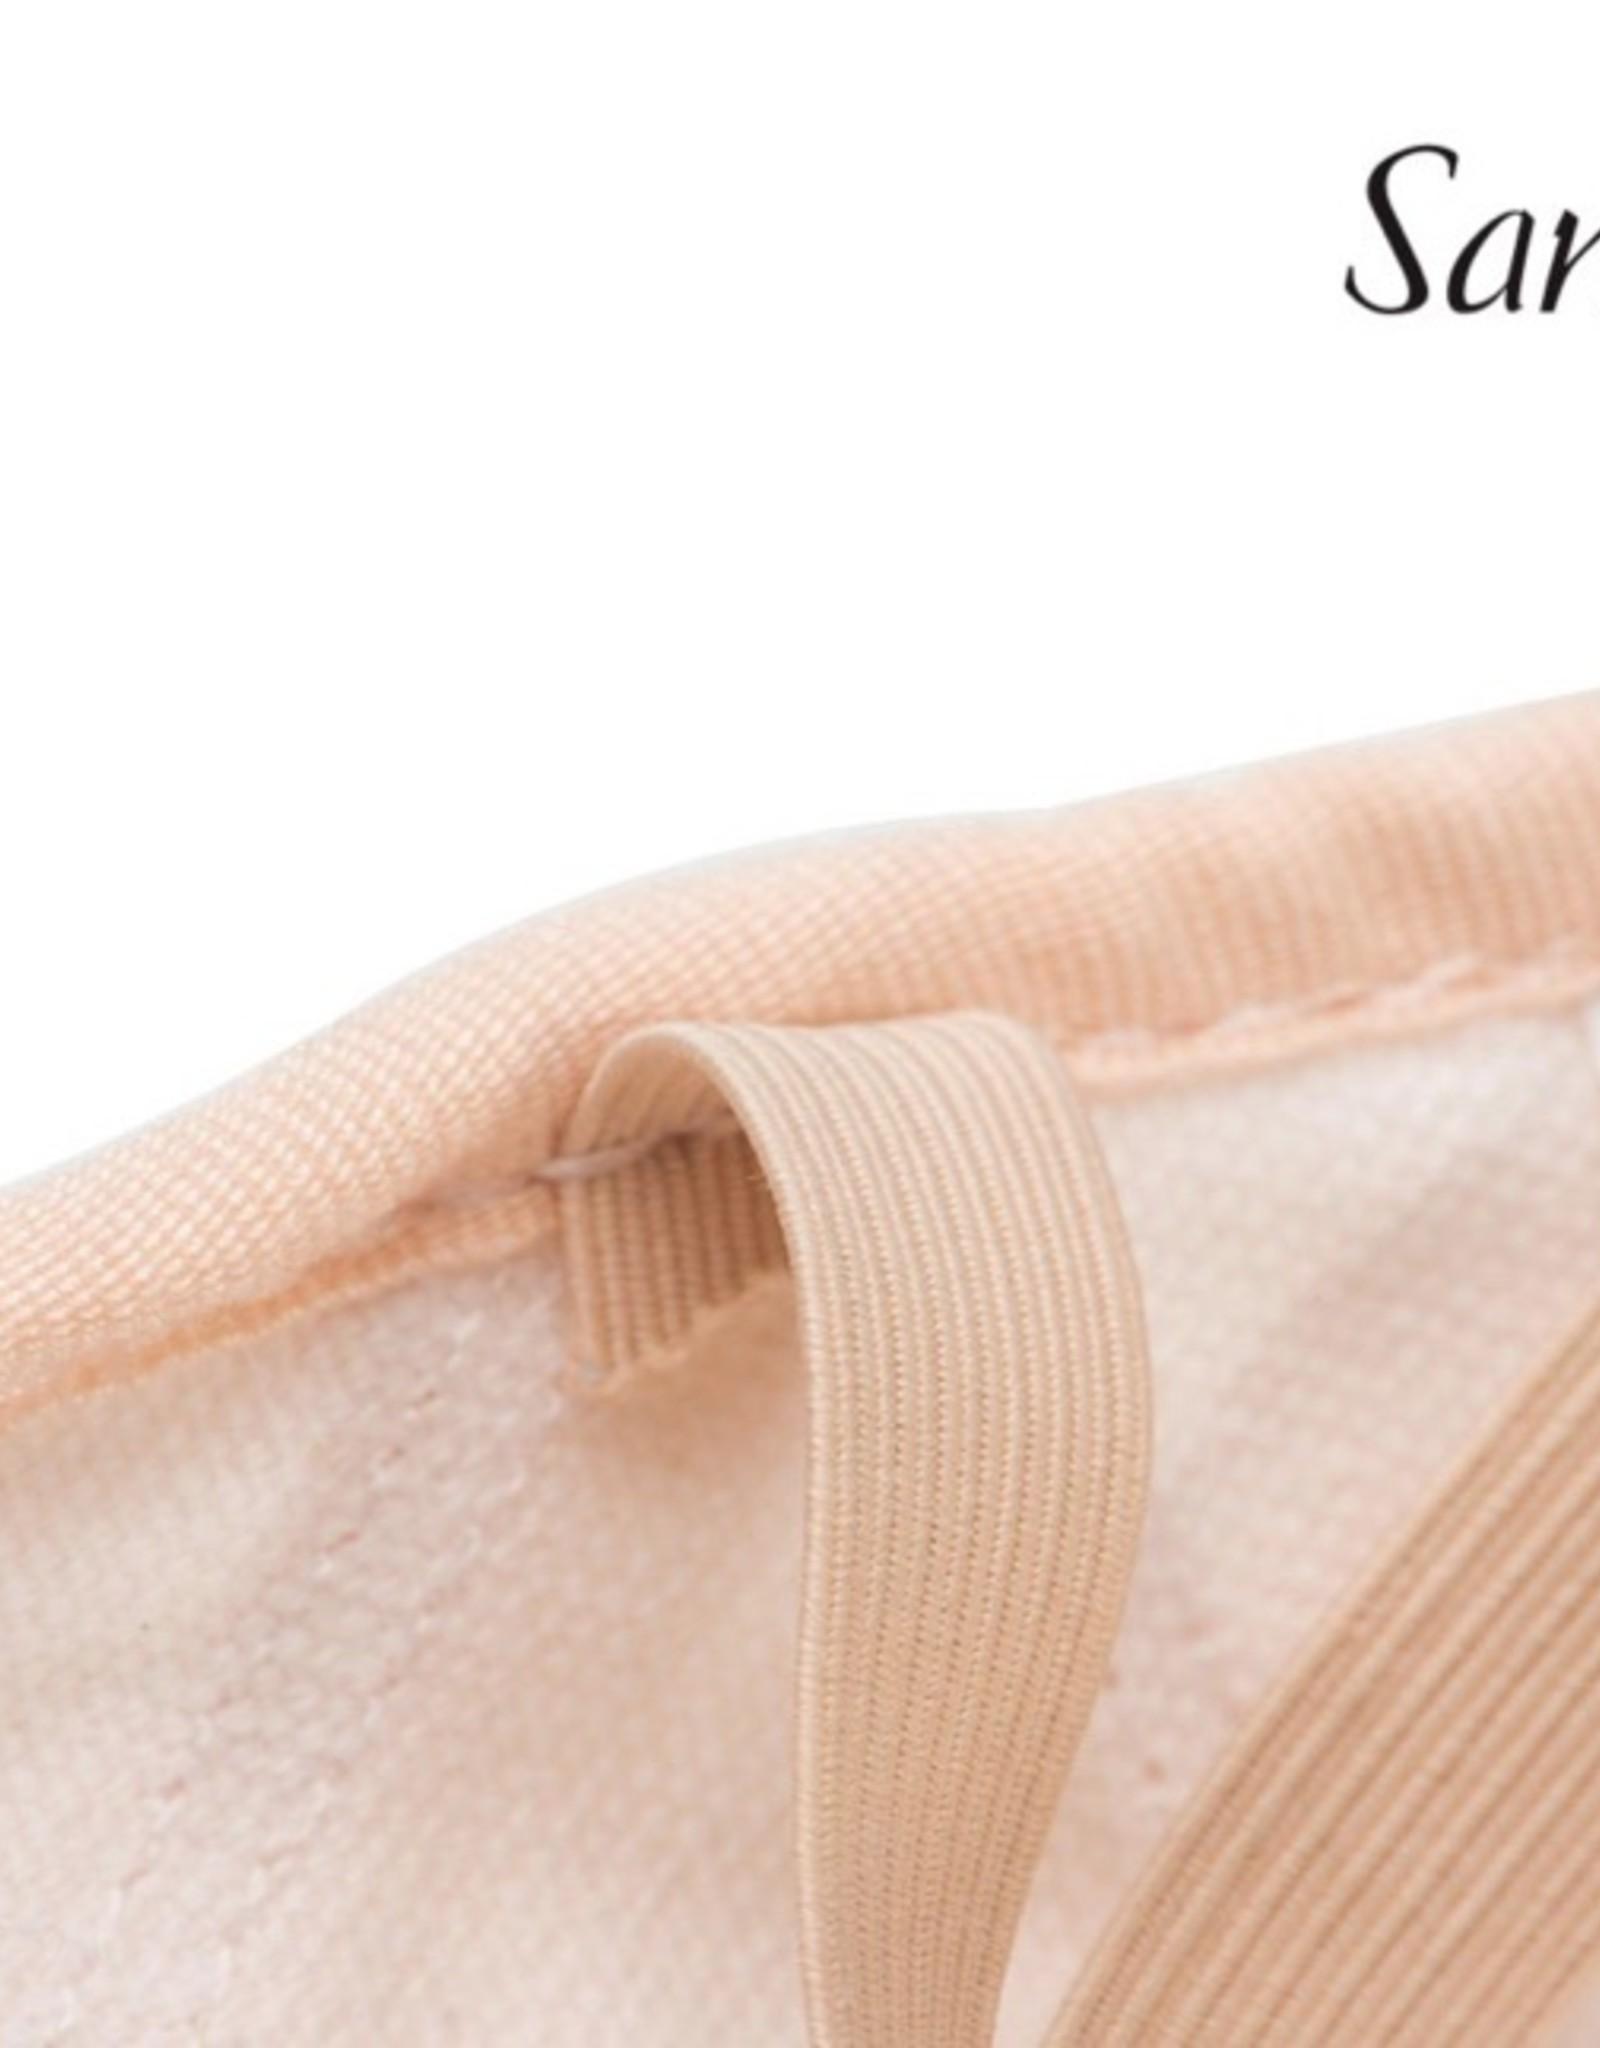 Sansha Roze balletsloefjes Sansha Silhouette